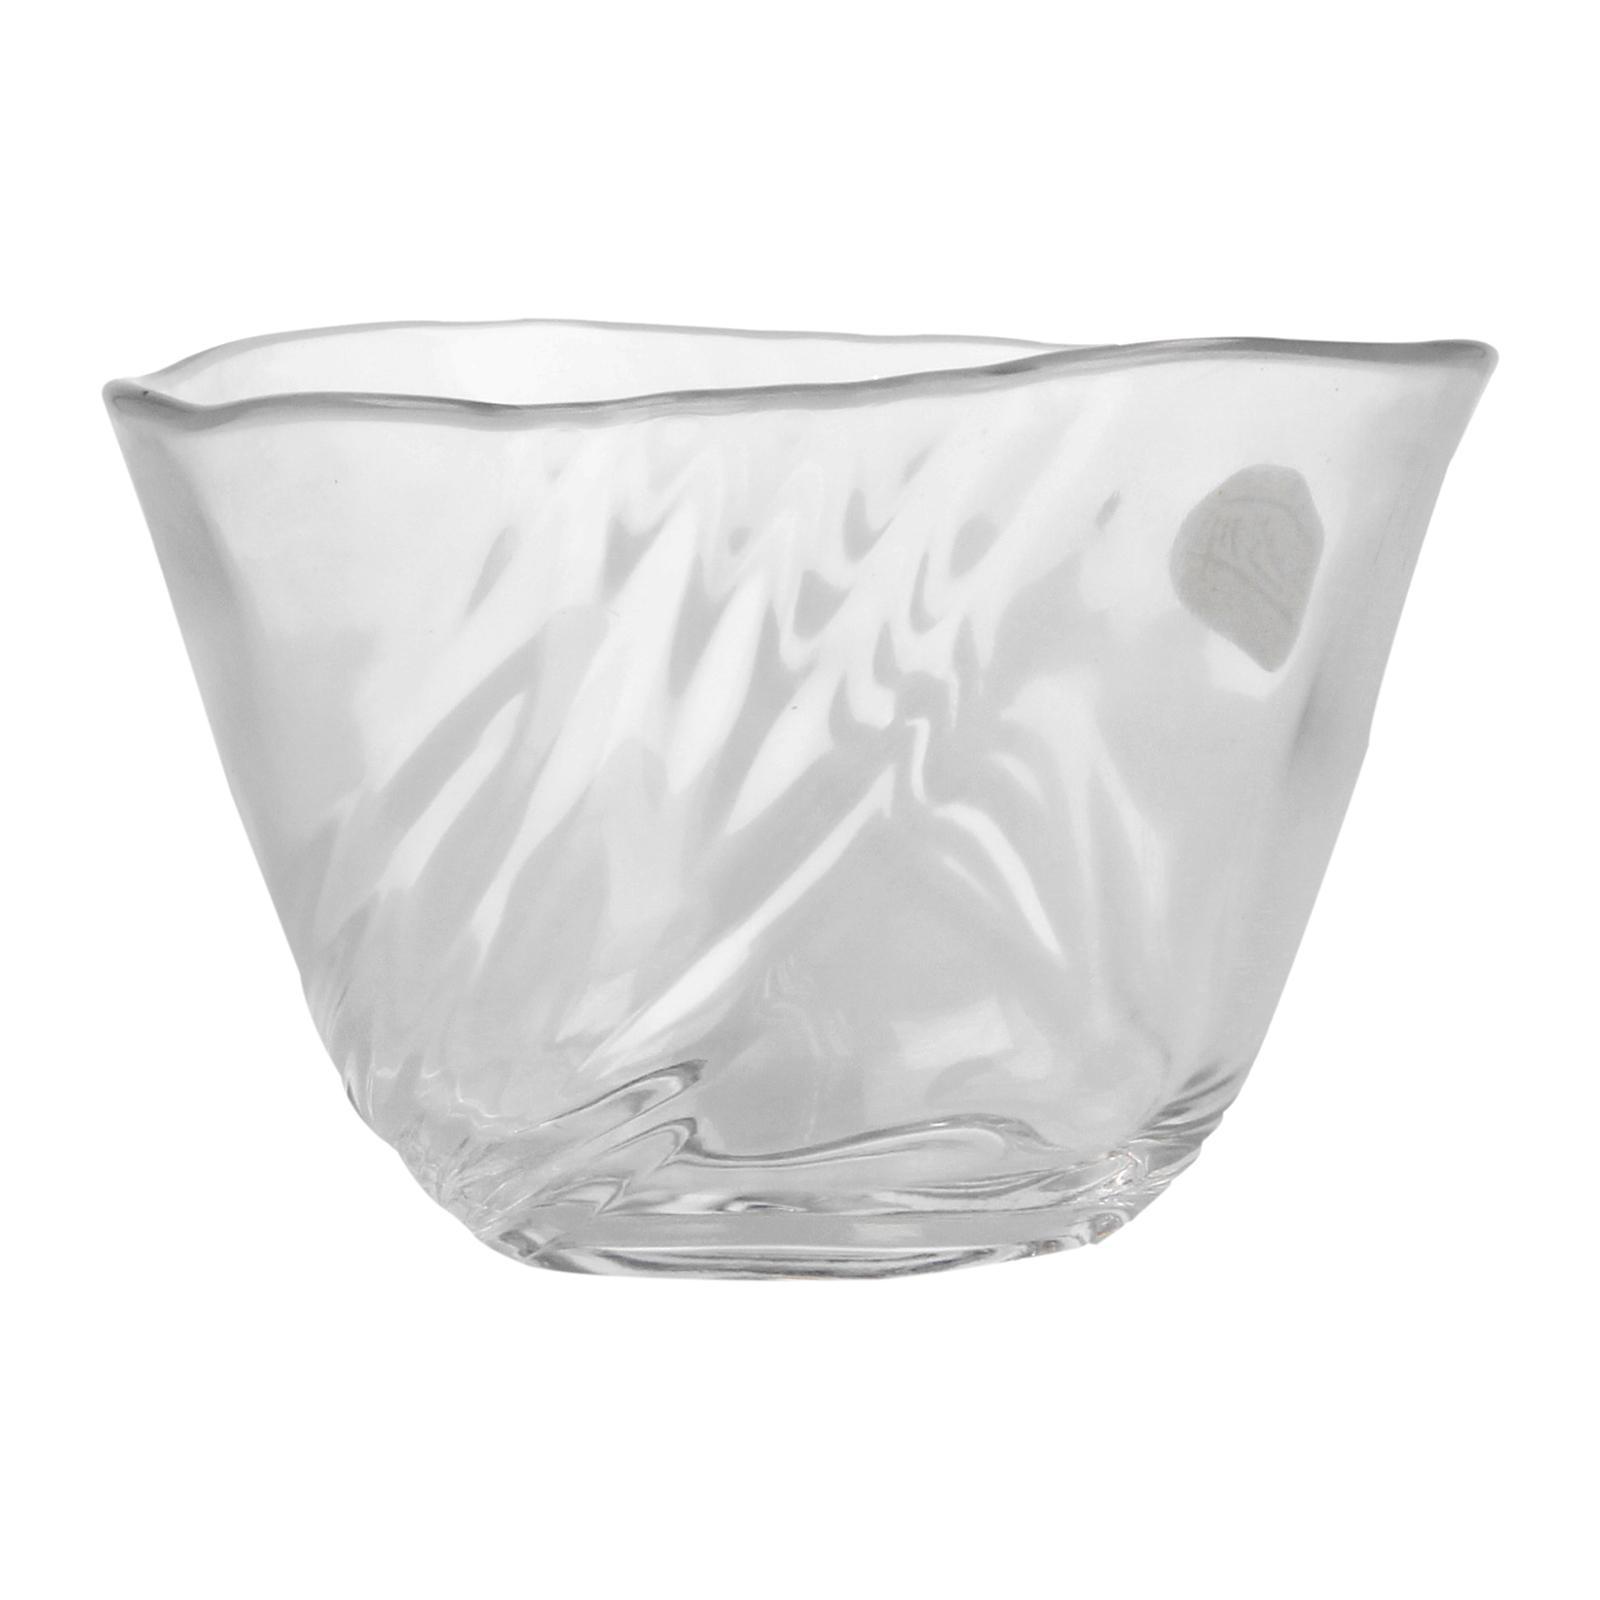 Soga KMGW Glass Bowl 9.5 CM 3-PCS Set